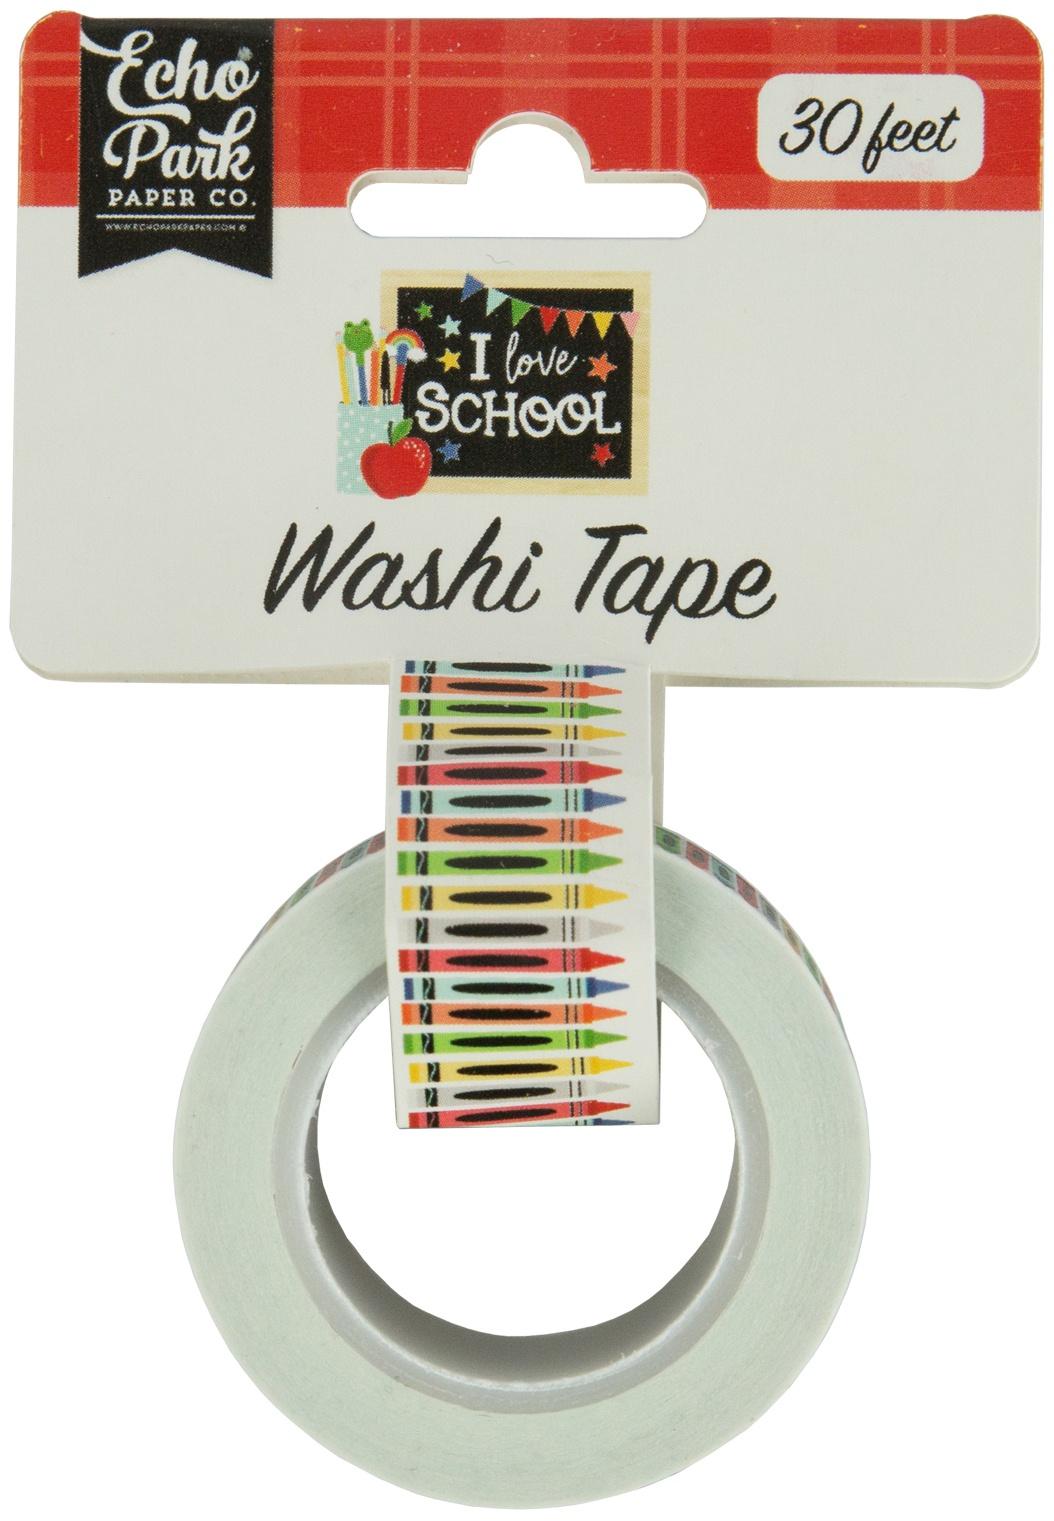 Echo Park I Love School Washi Tape 30'-Crayons